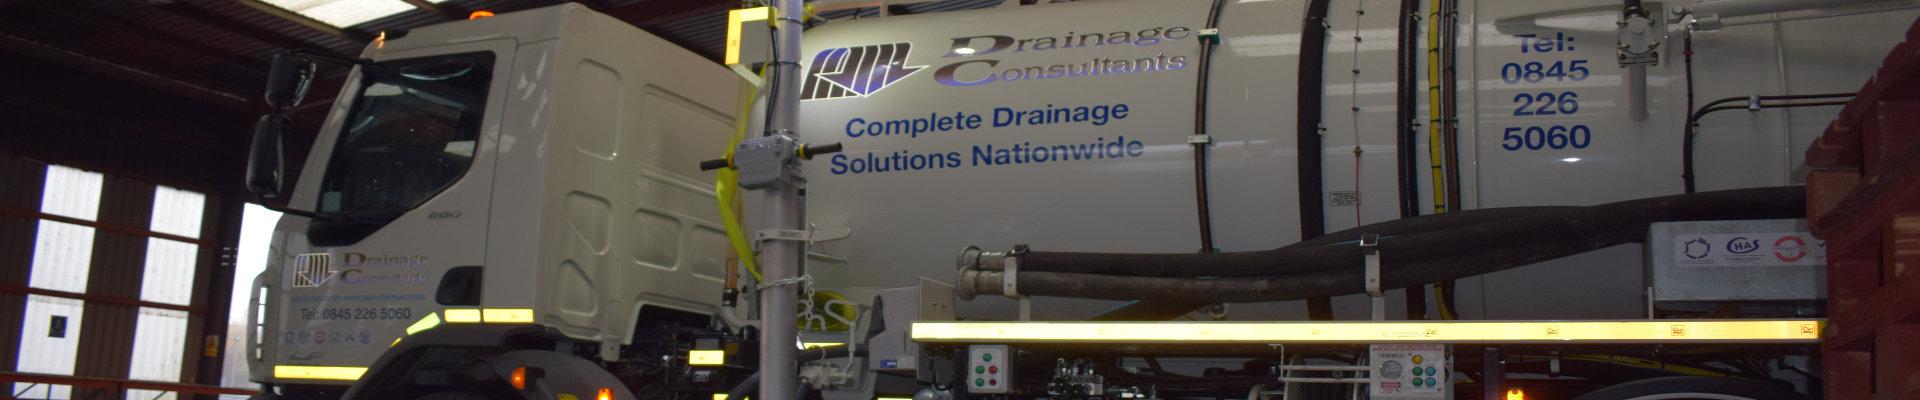 drainage tank